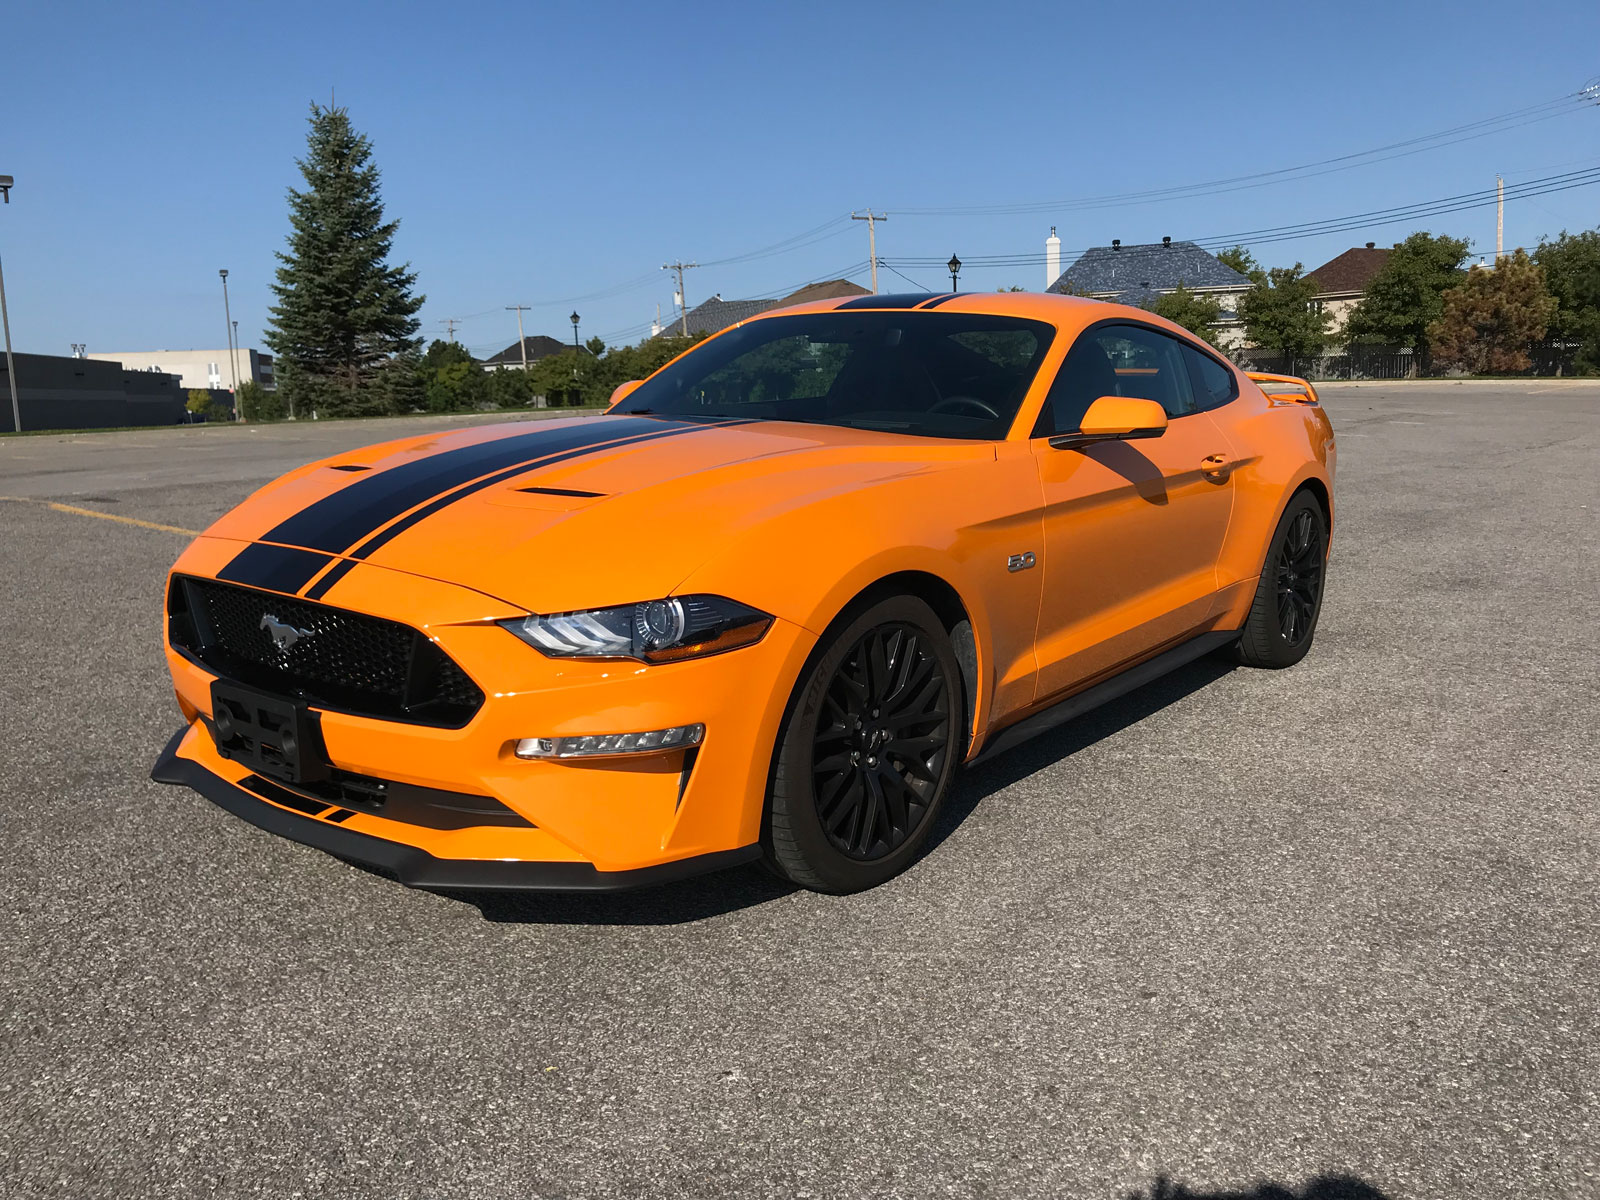 2018 Mustang GT 5.0 Review